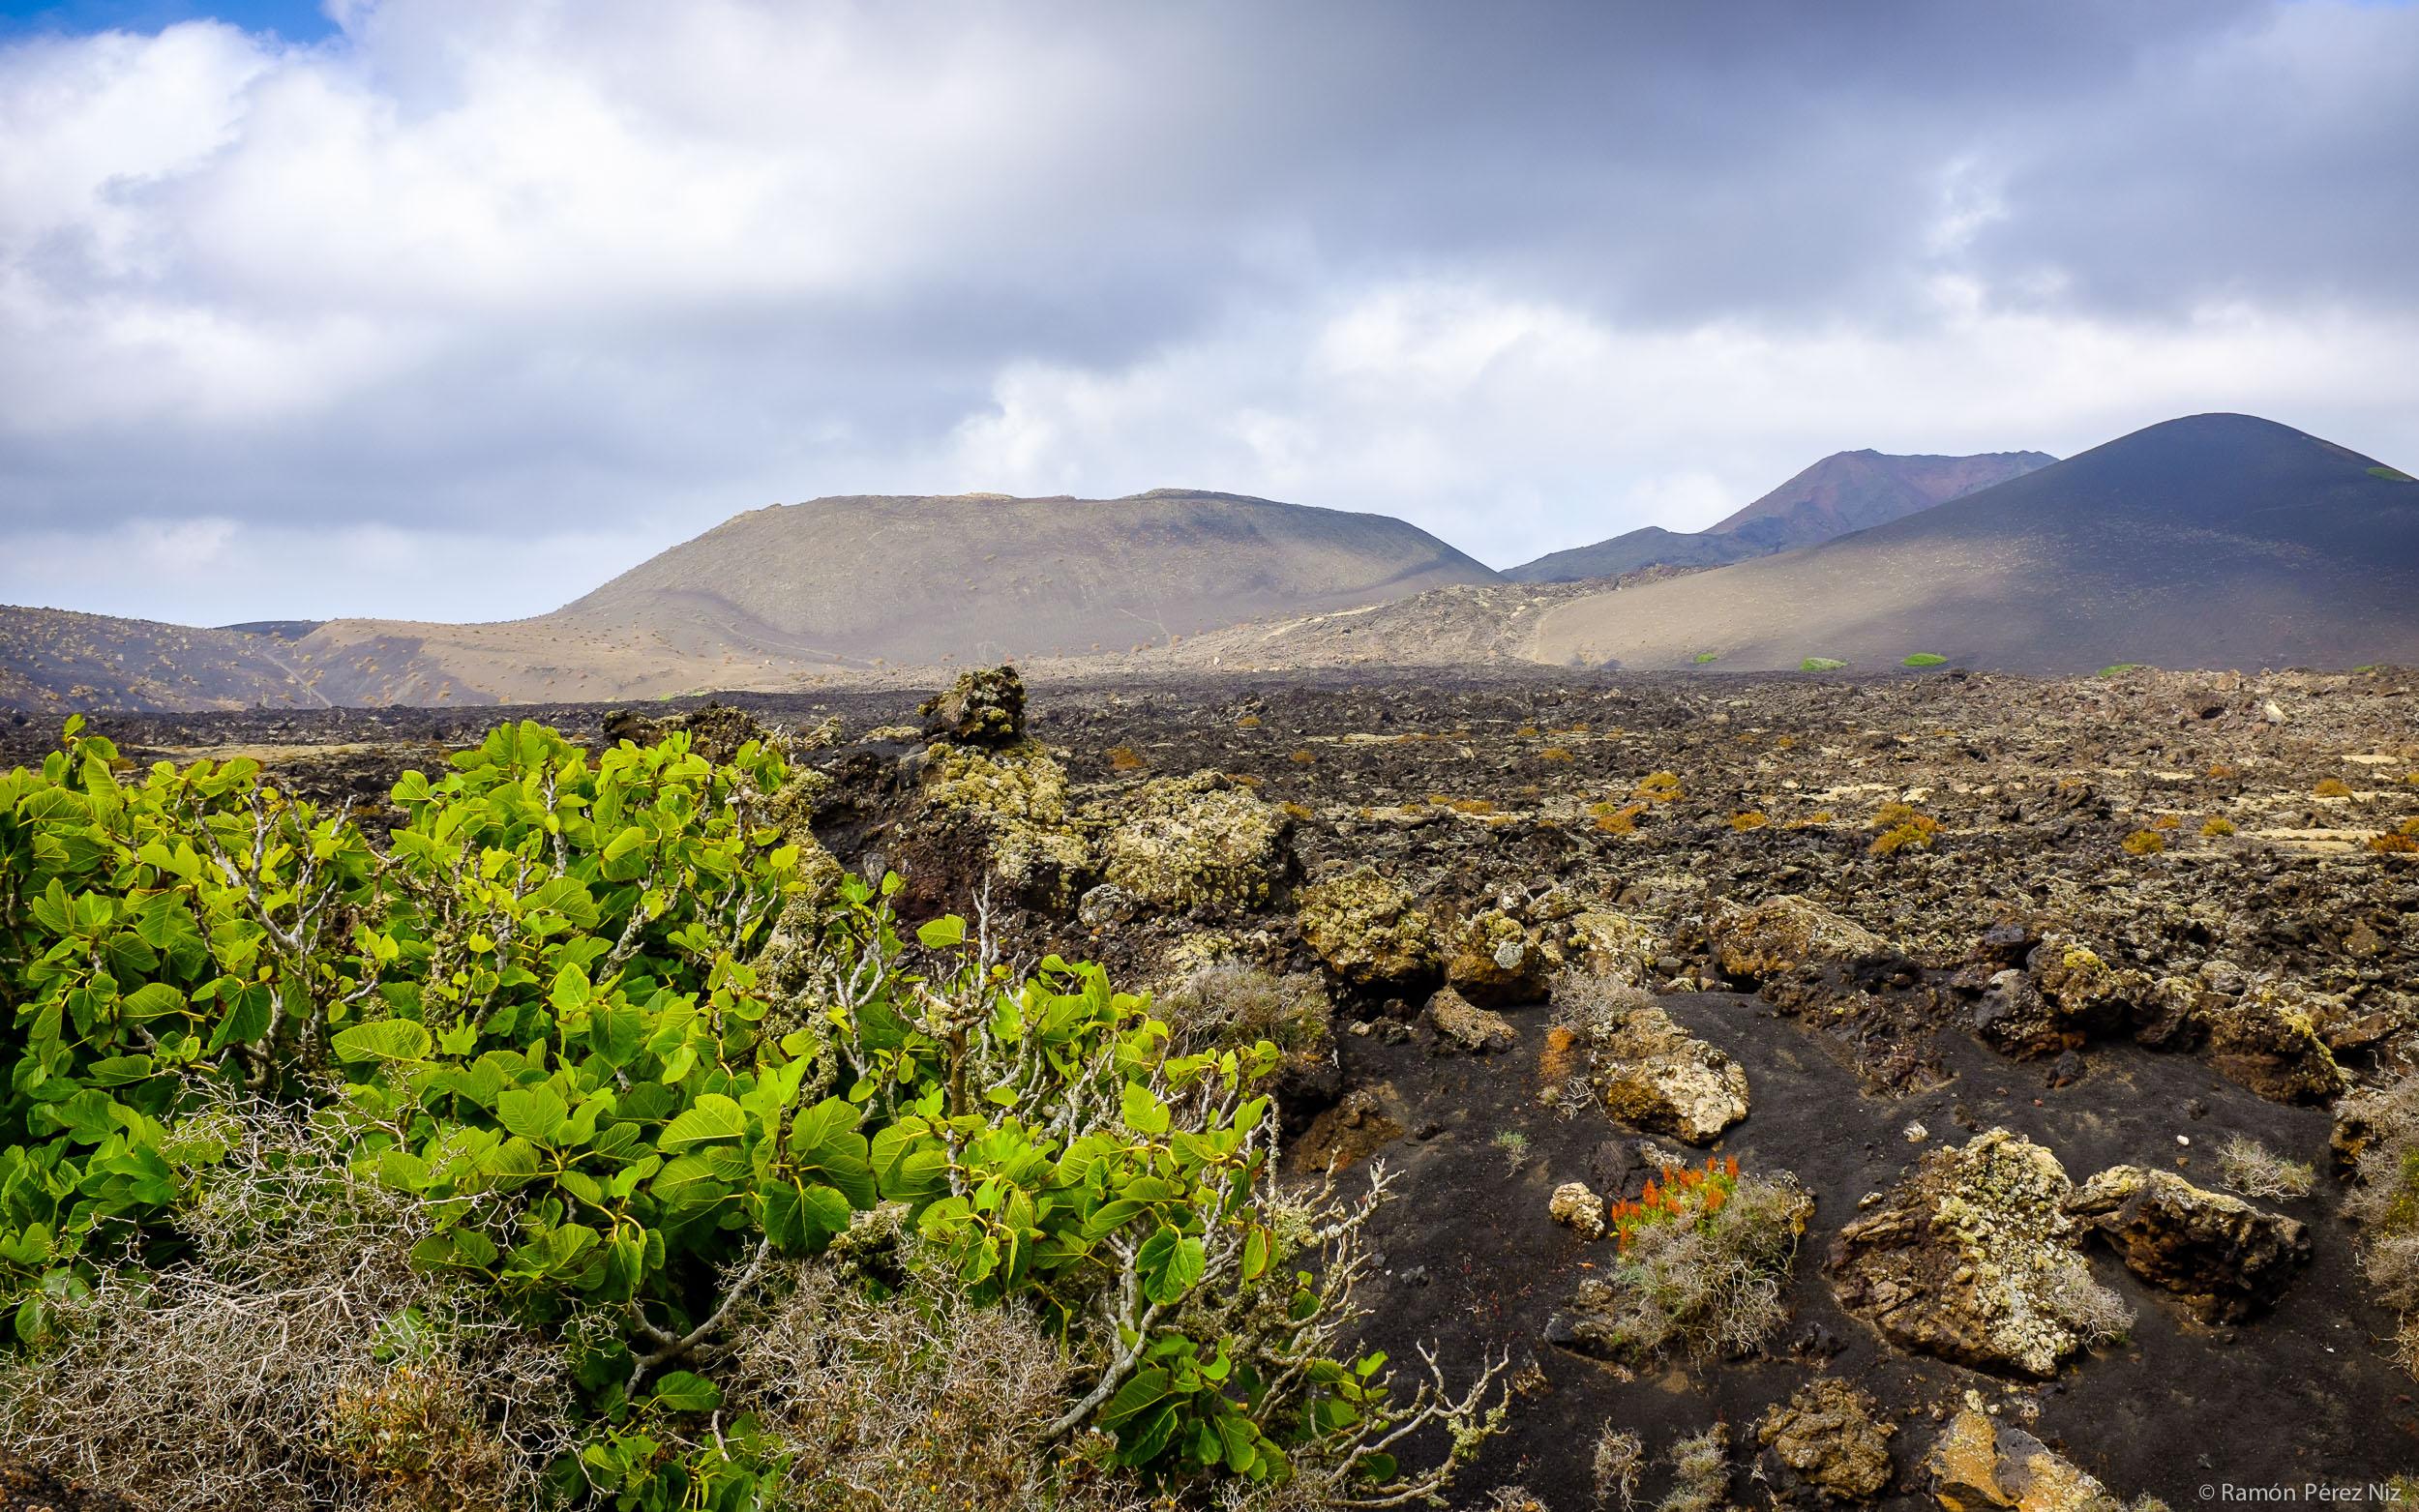 Foto de Ramón Pérez Niz, Volcán de Santa Catalina